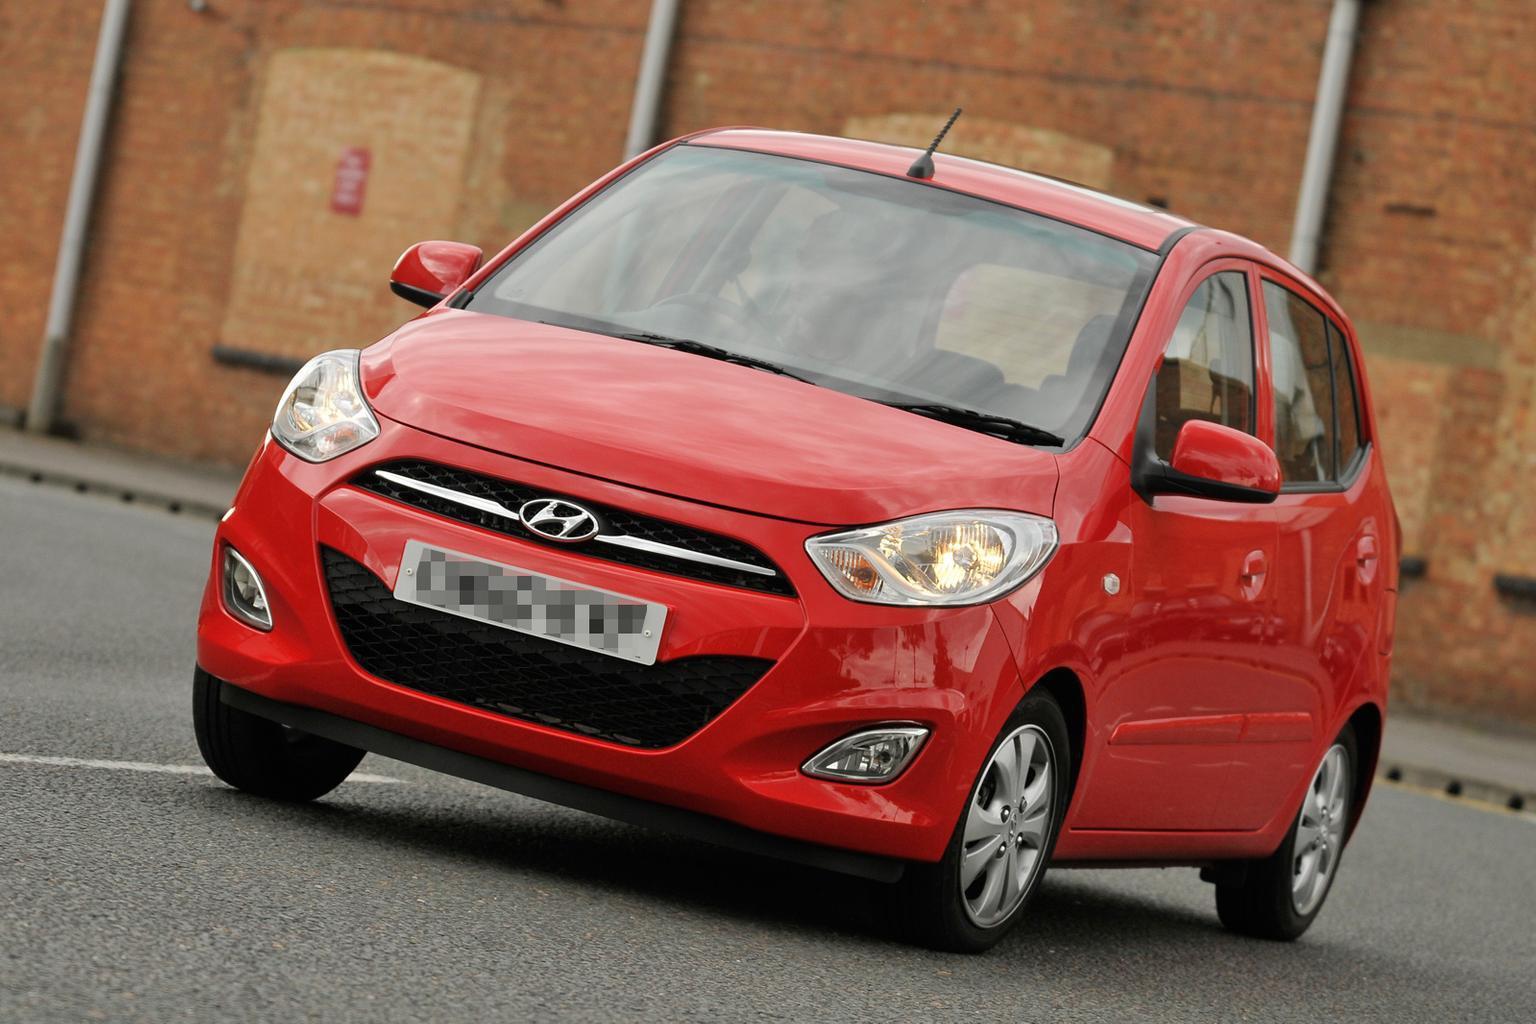 Hyundai i10 stock shortage problem